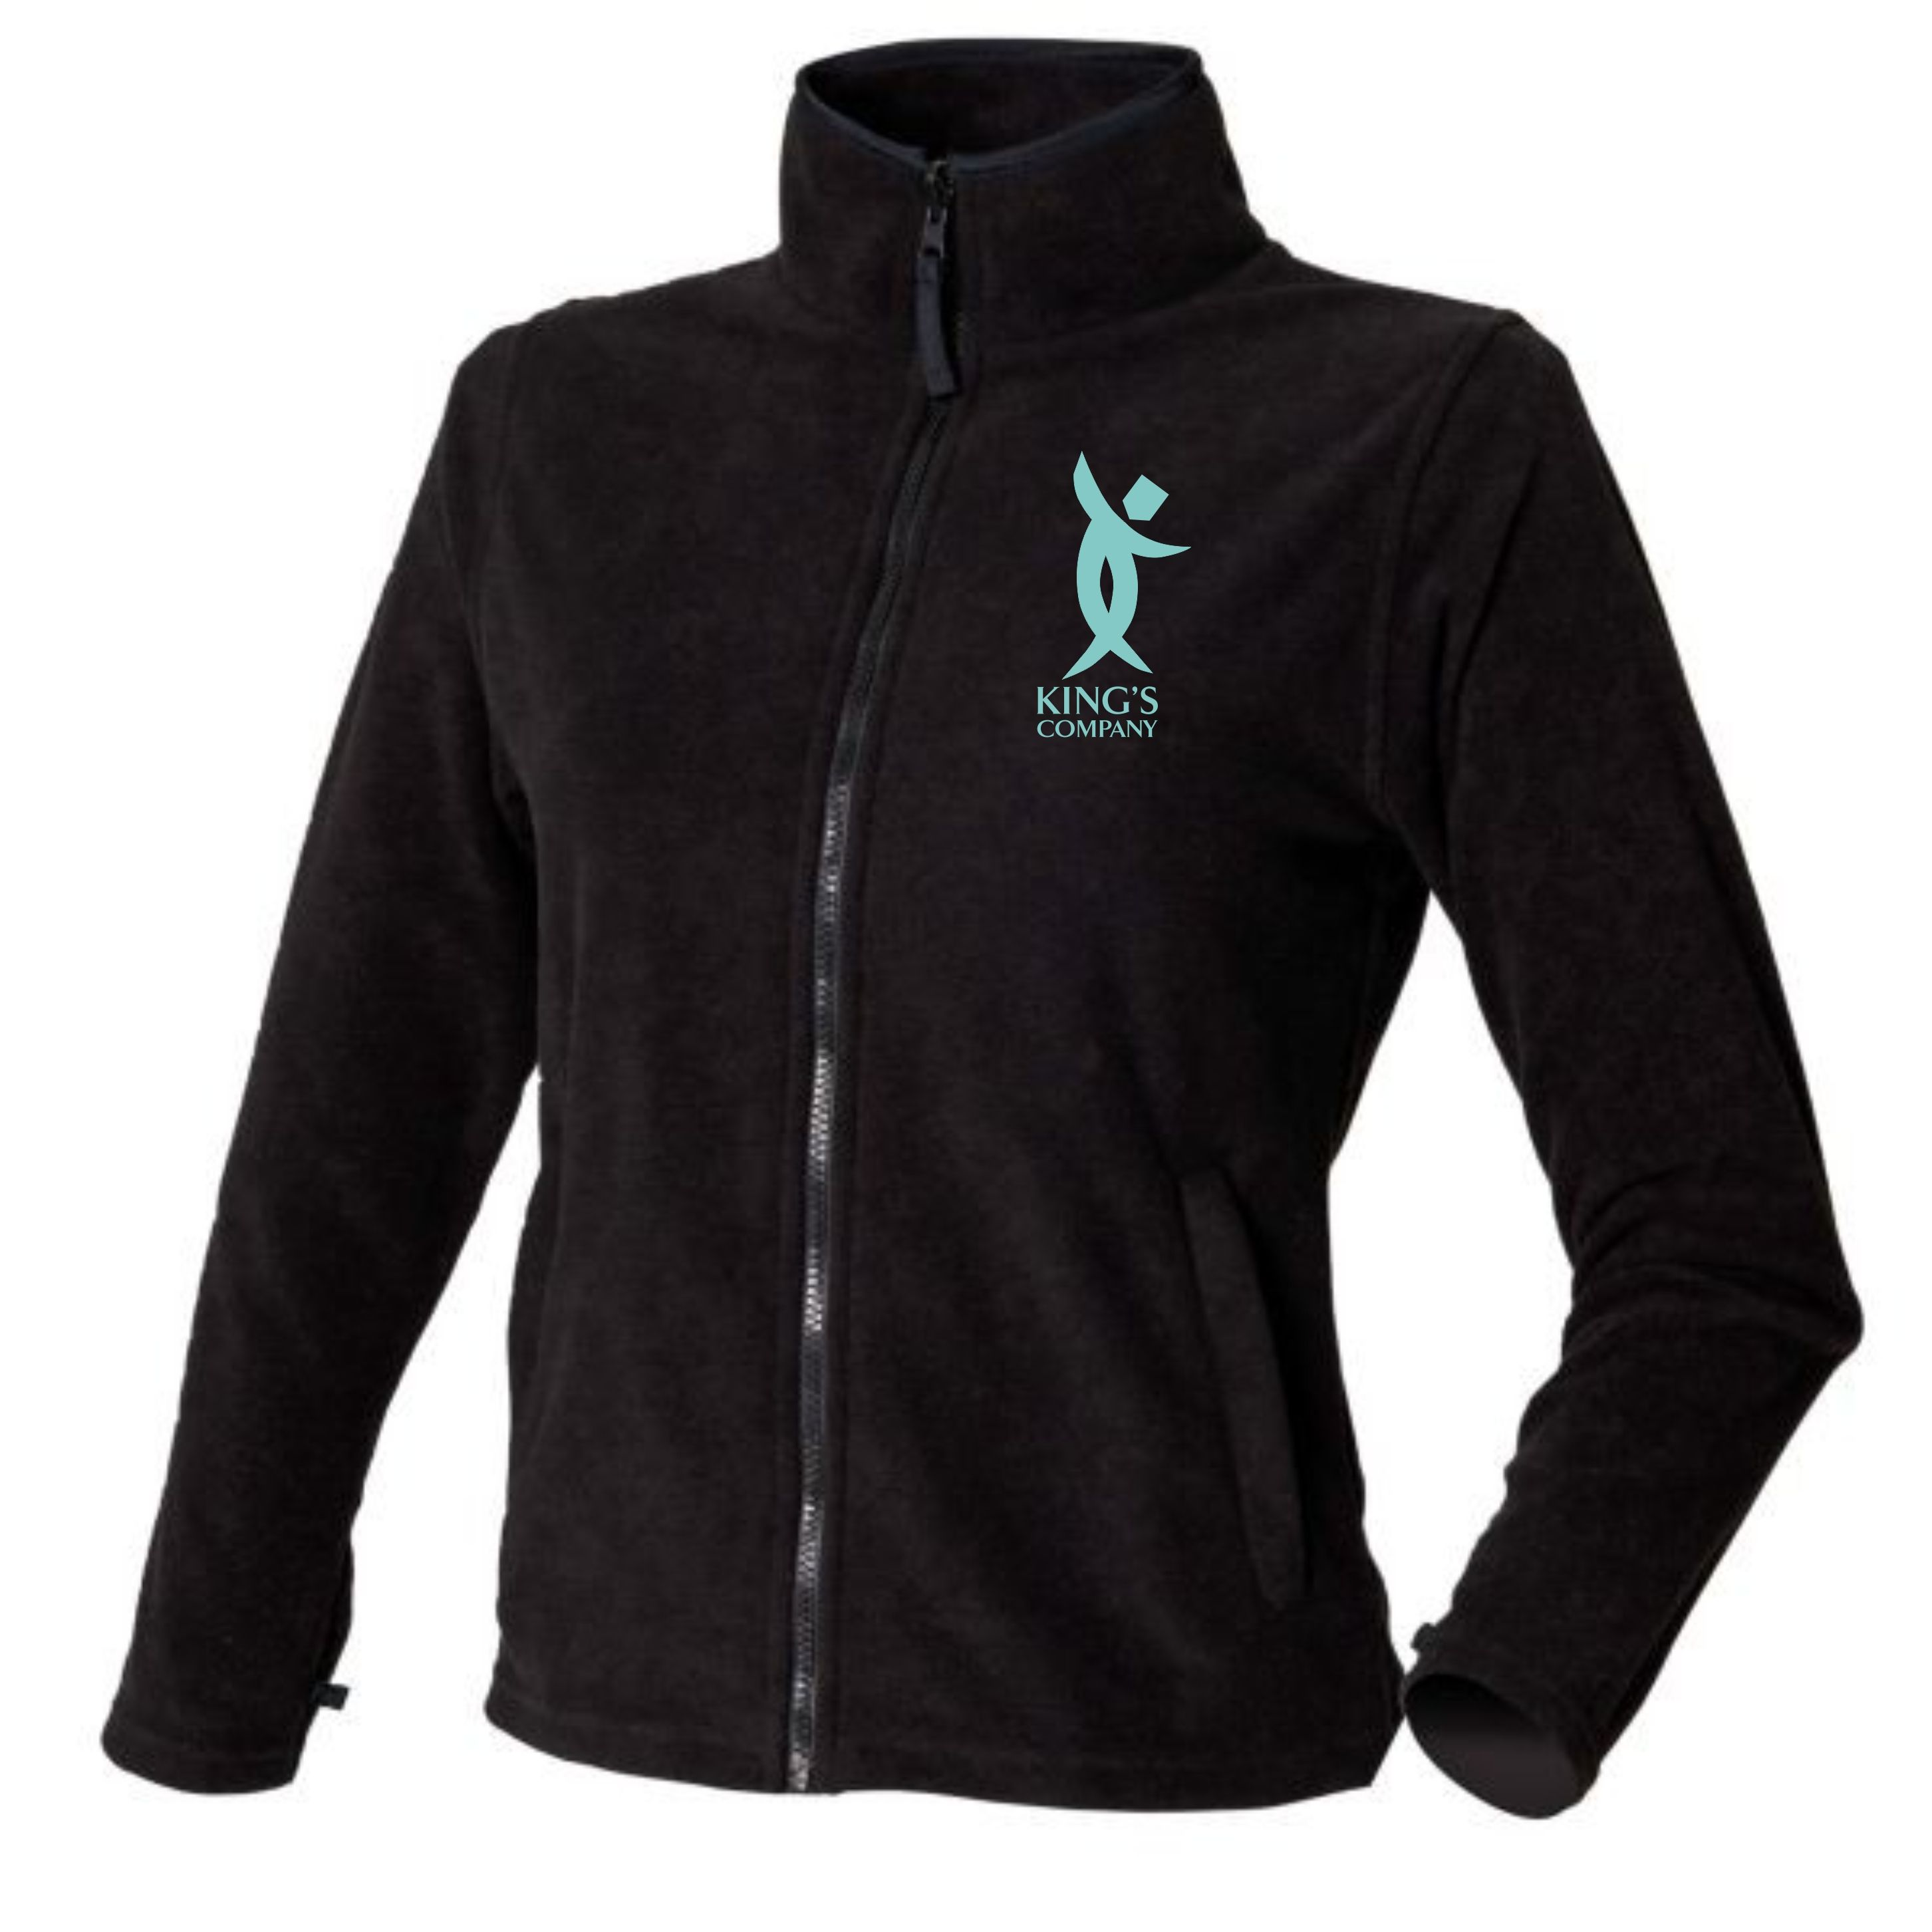 King's Company - Ladies Microfleece Jacket